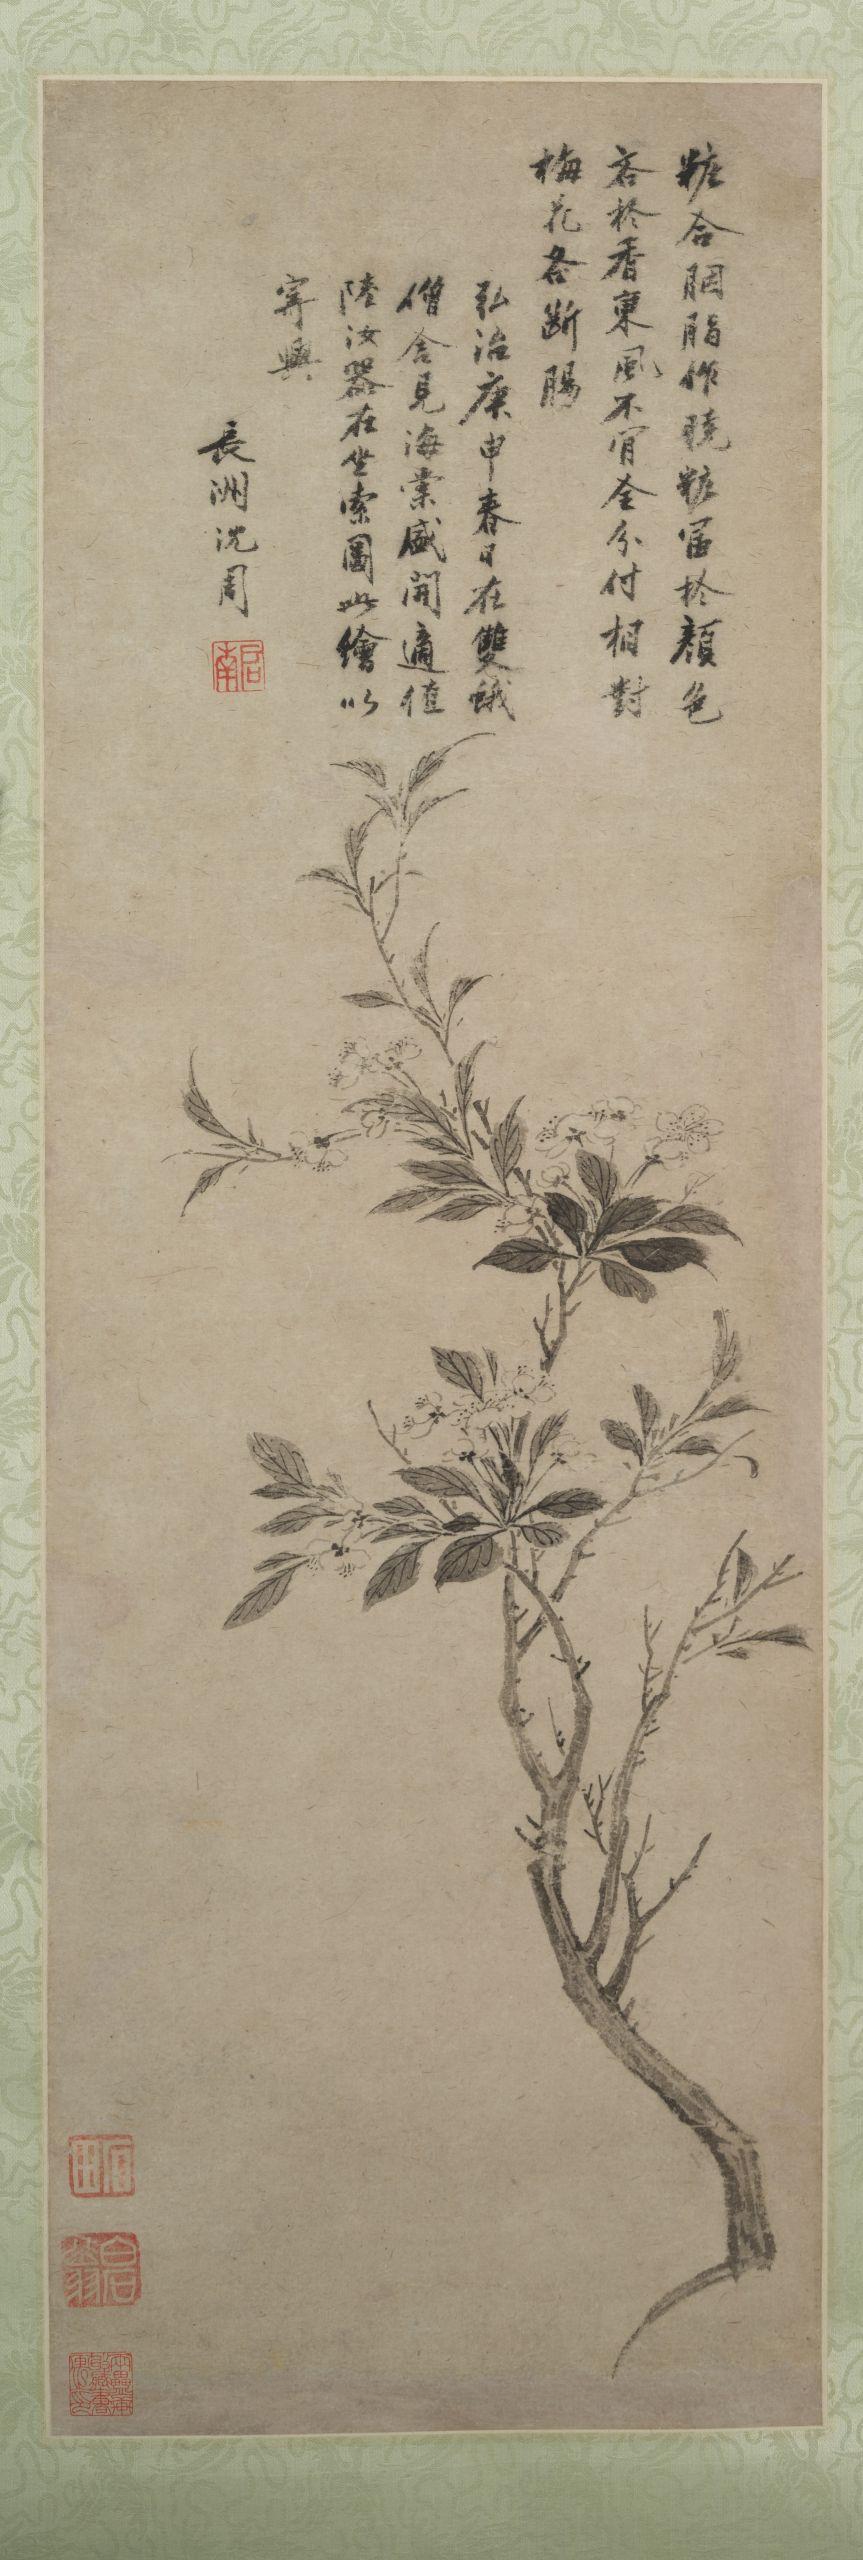 2243px Ren Yu Landscape 1915 97 2 Cleveland Museum of Art tiff